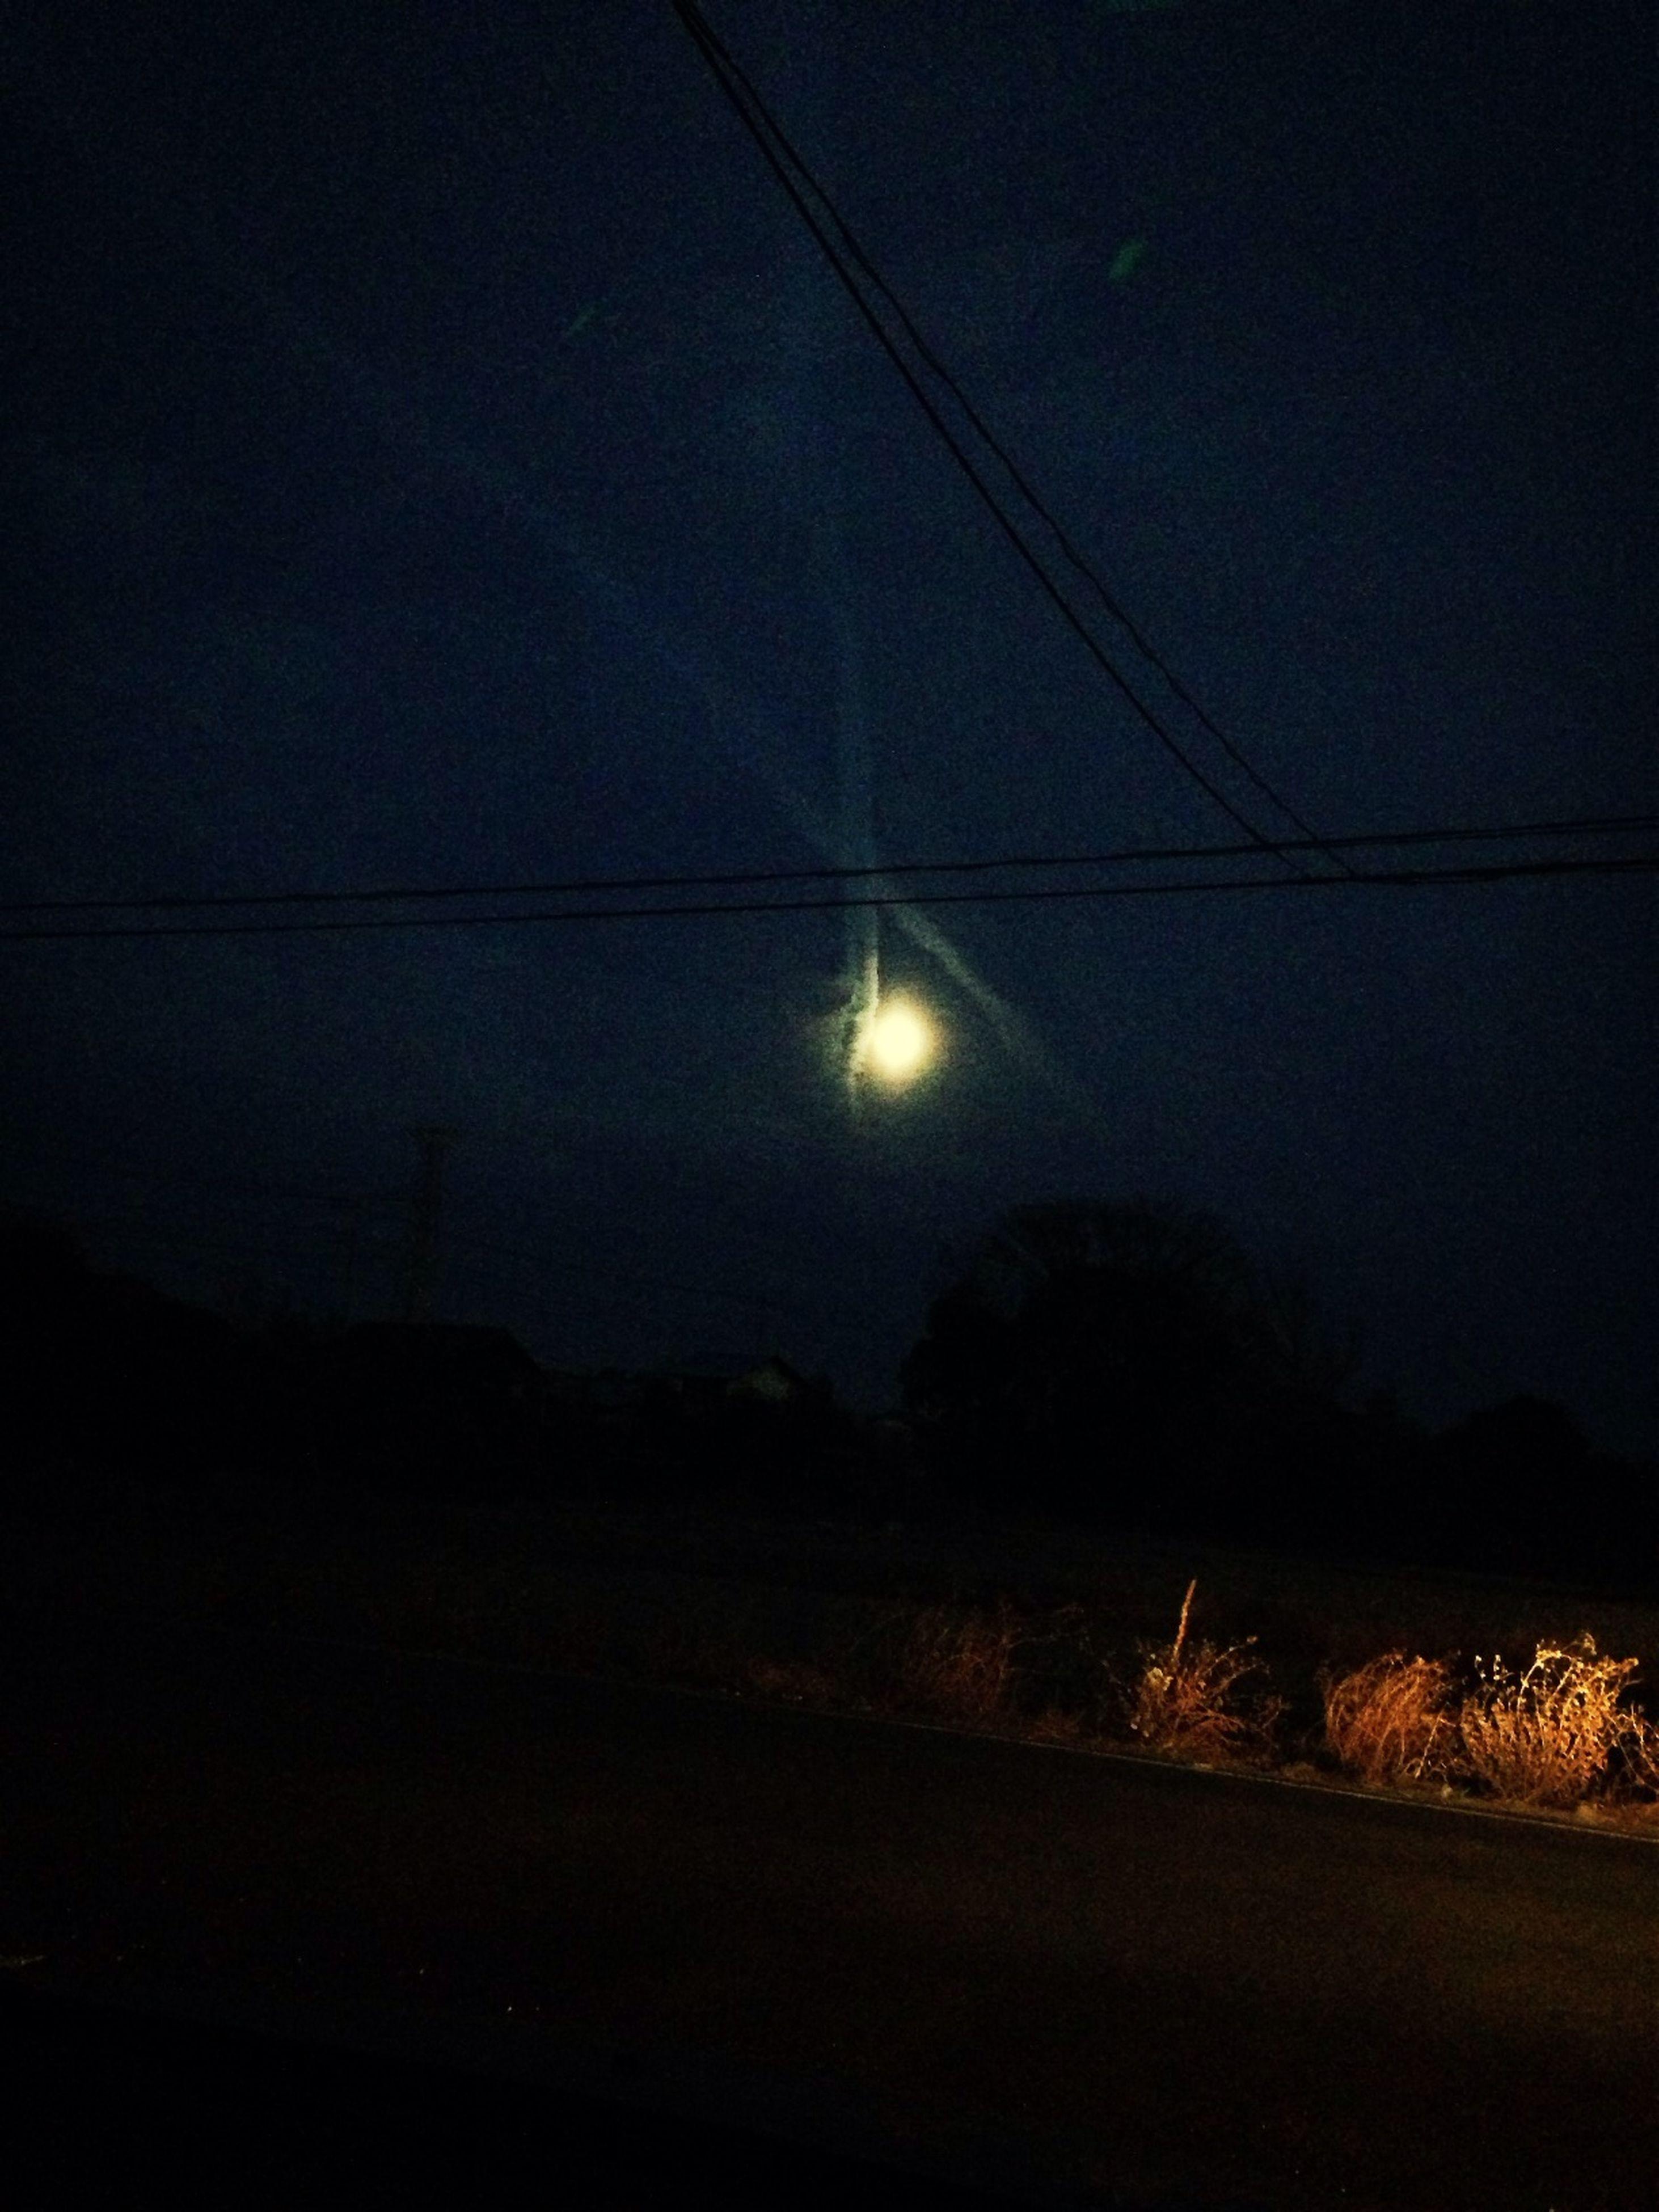 night, illuminated, silhouette, dark, light - natural phenomenon, lighting equipment, low angle view, street light, electricity, dusk, sky, moon, indoors, tree, copy space, light, mystery, nature, no people